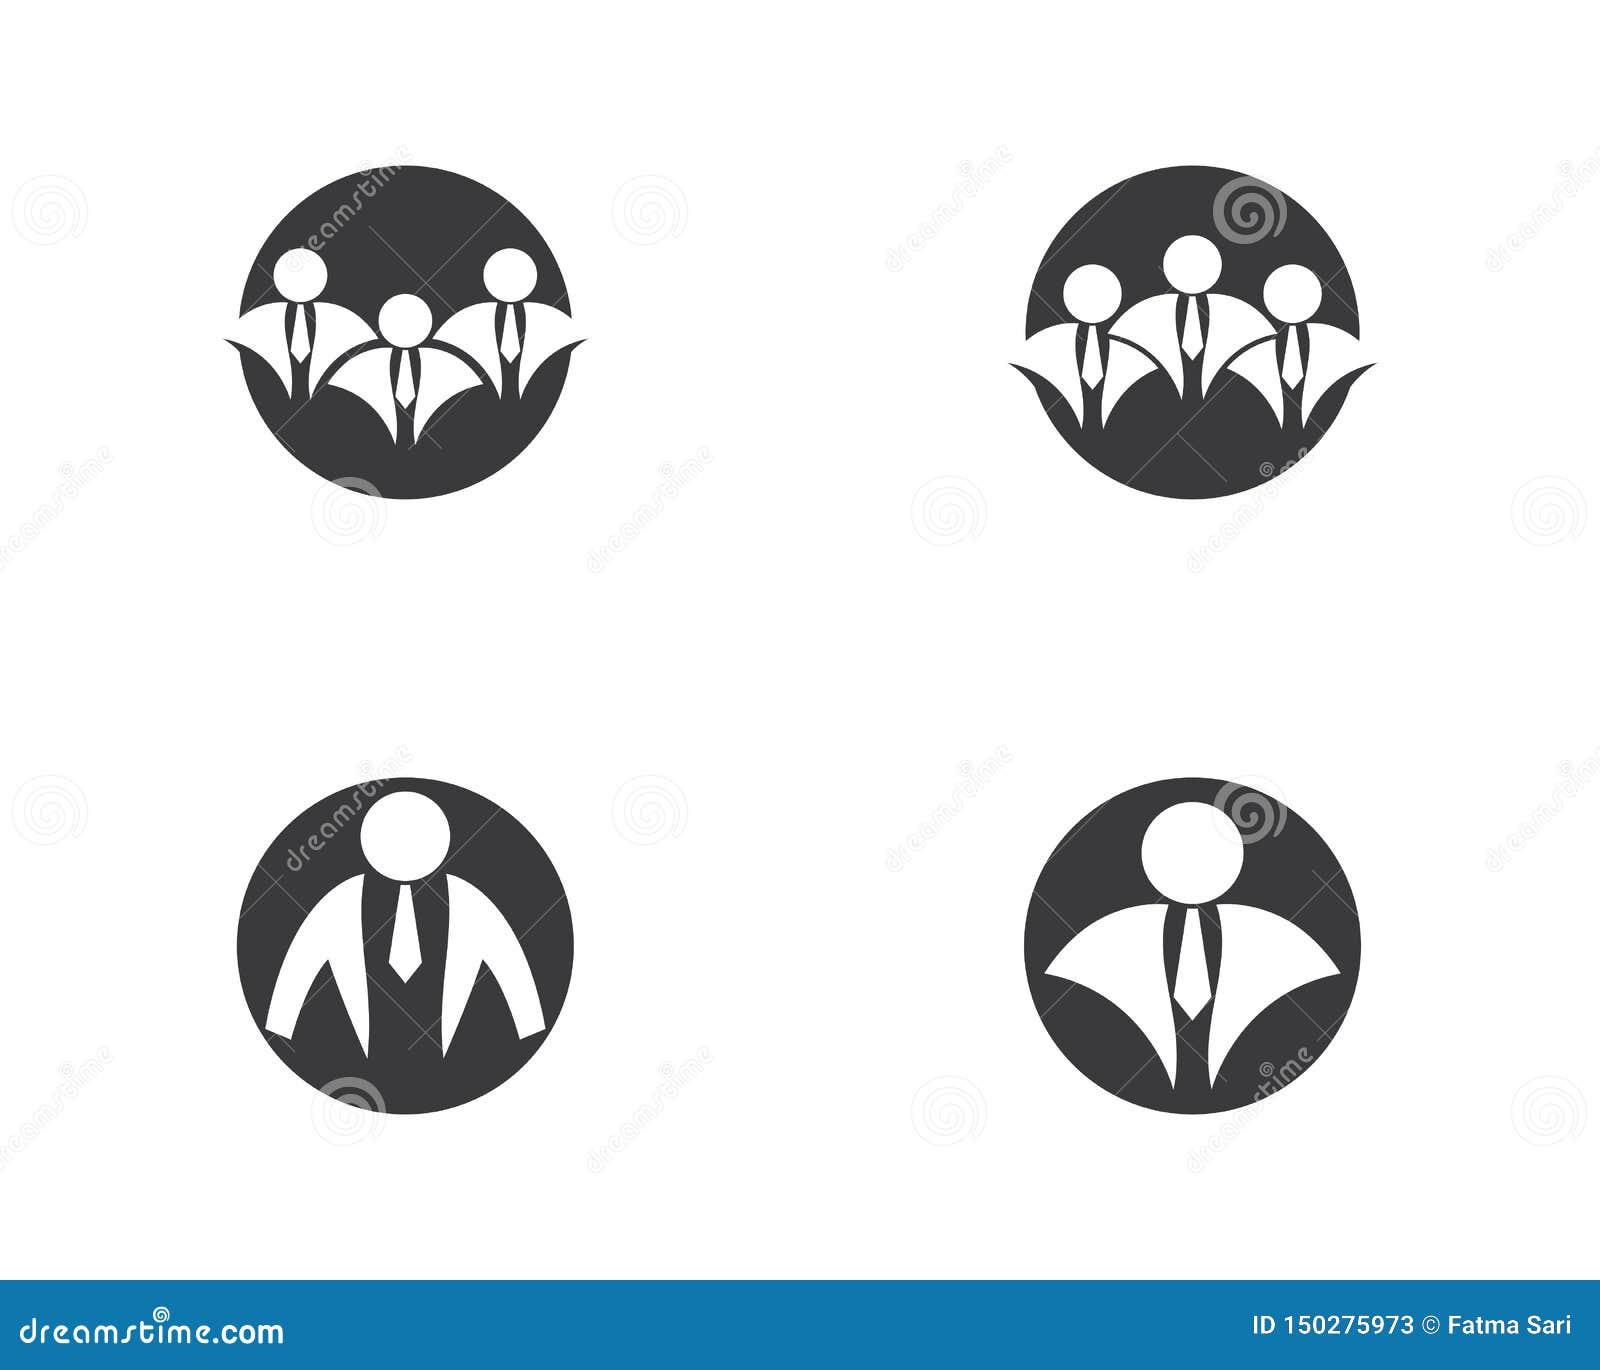 Businessman logo illustration